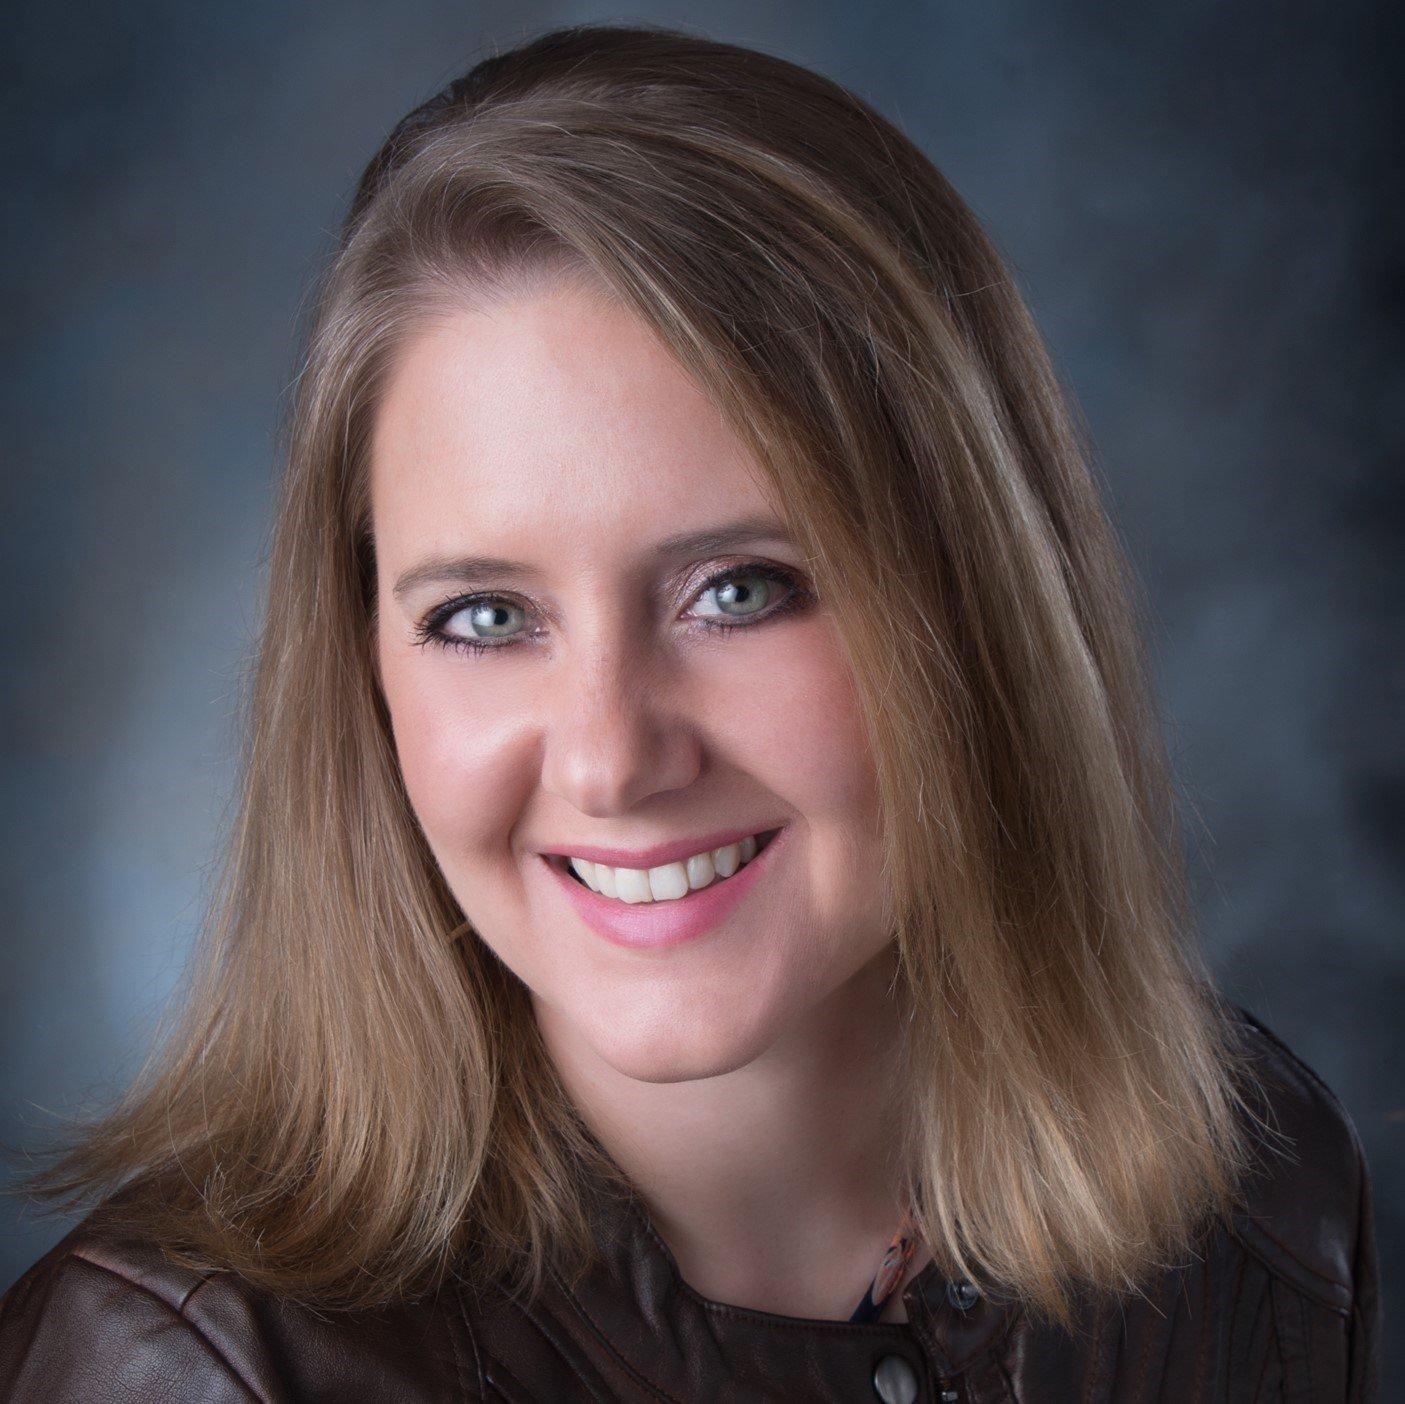 Columbus Community Hospital announces new ACU director